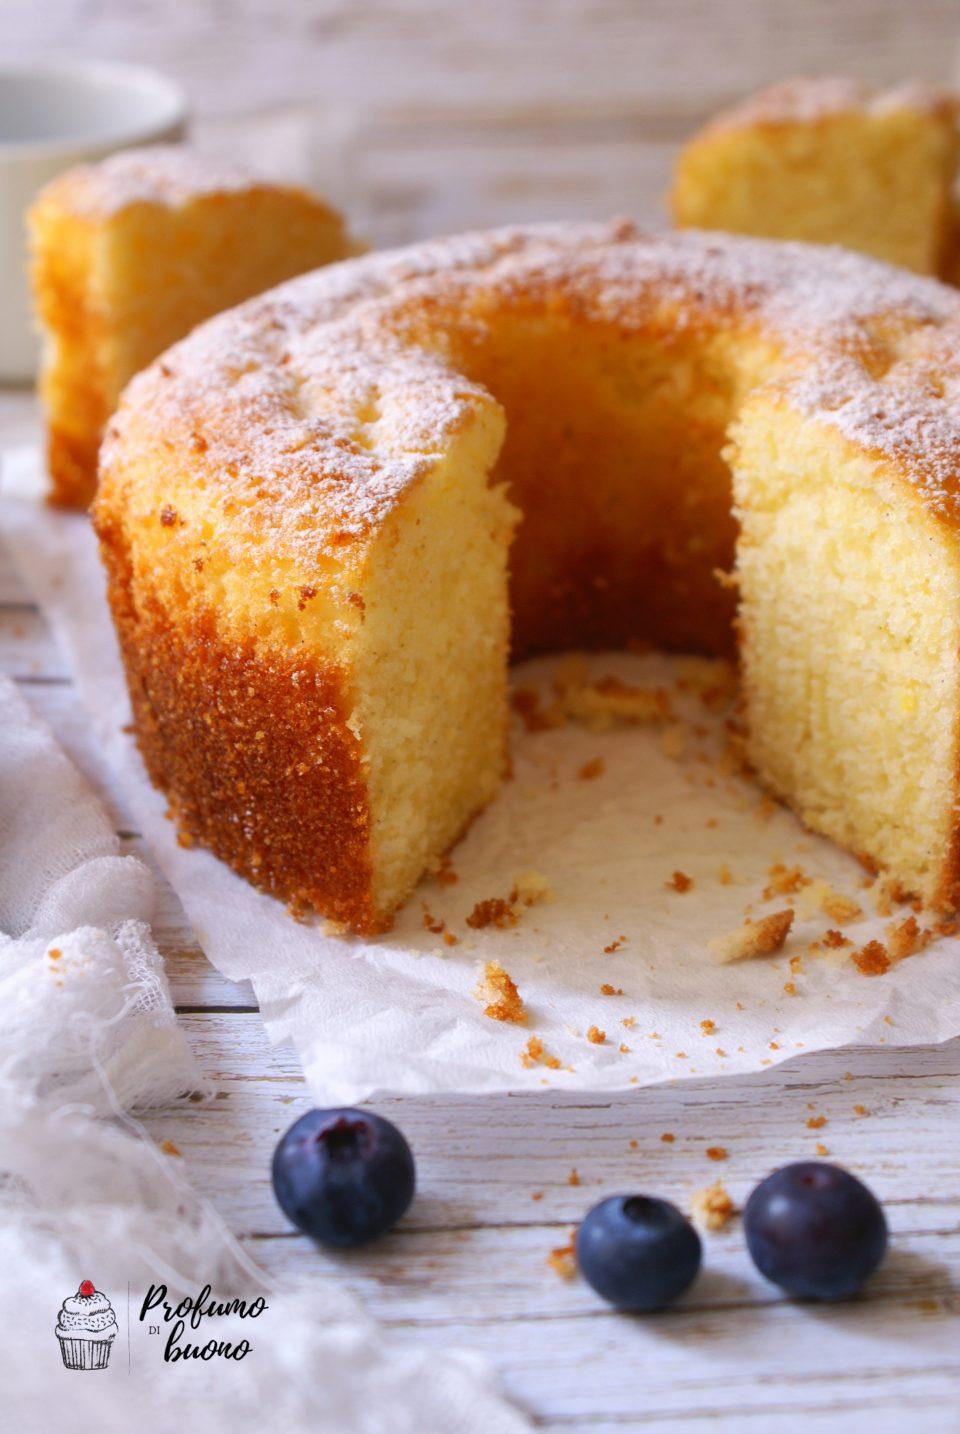 Chiffon cake senza glutine con zucchero a velo e mirtilli